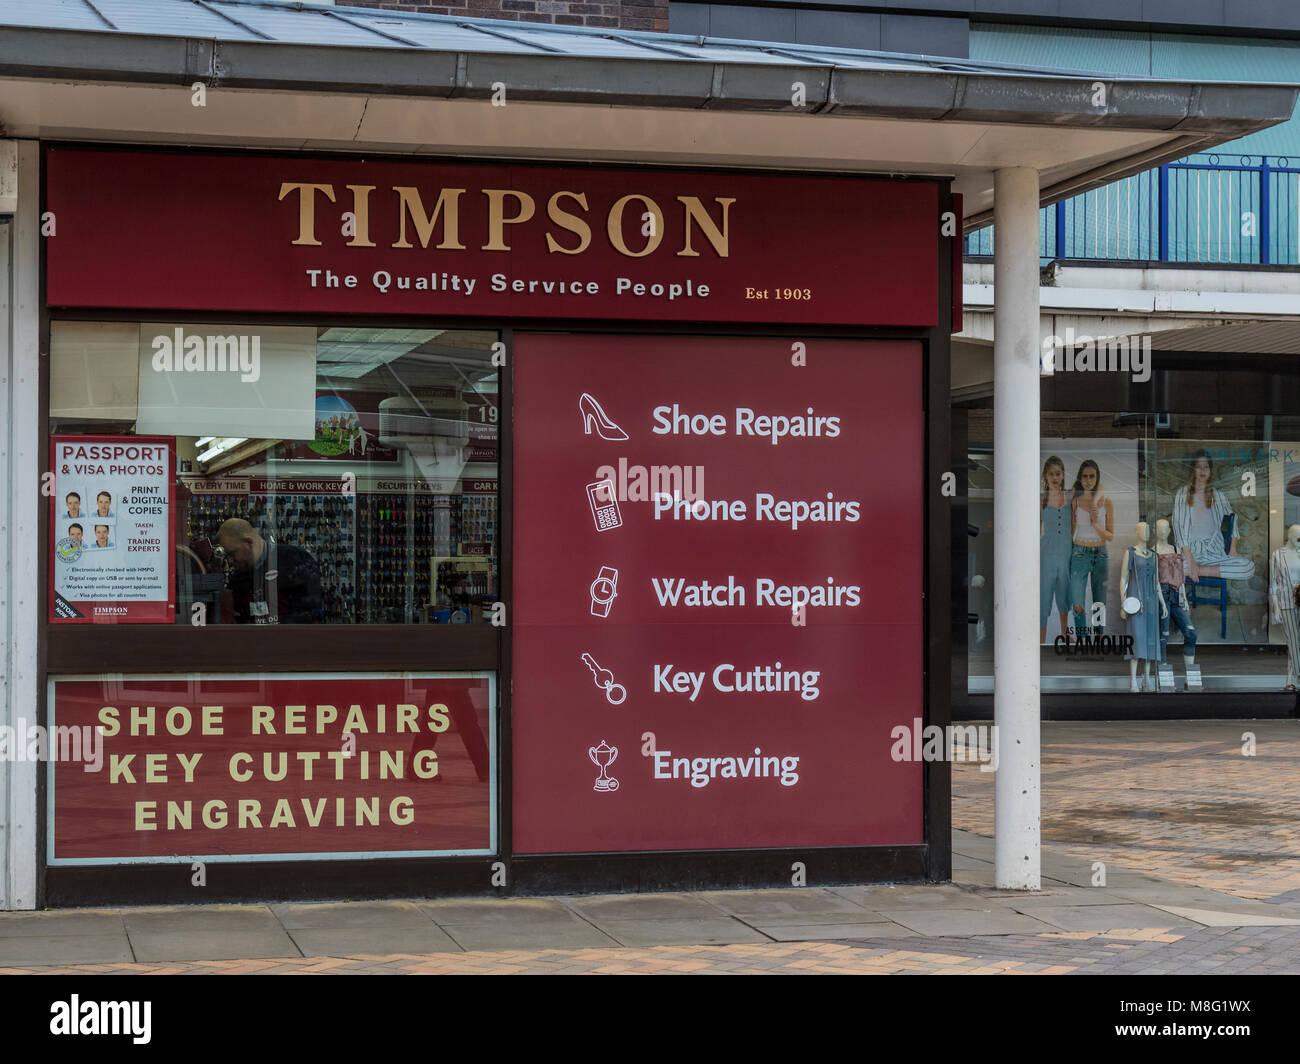 Chichester Shoe Repairs